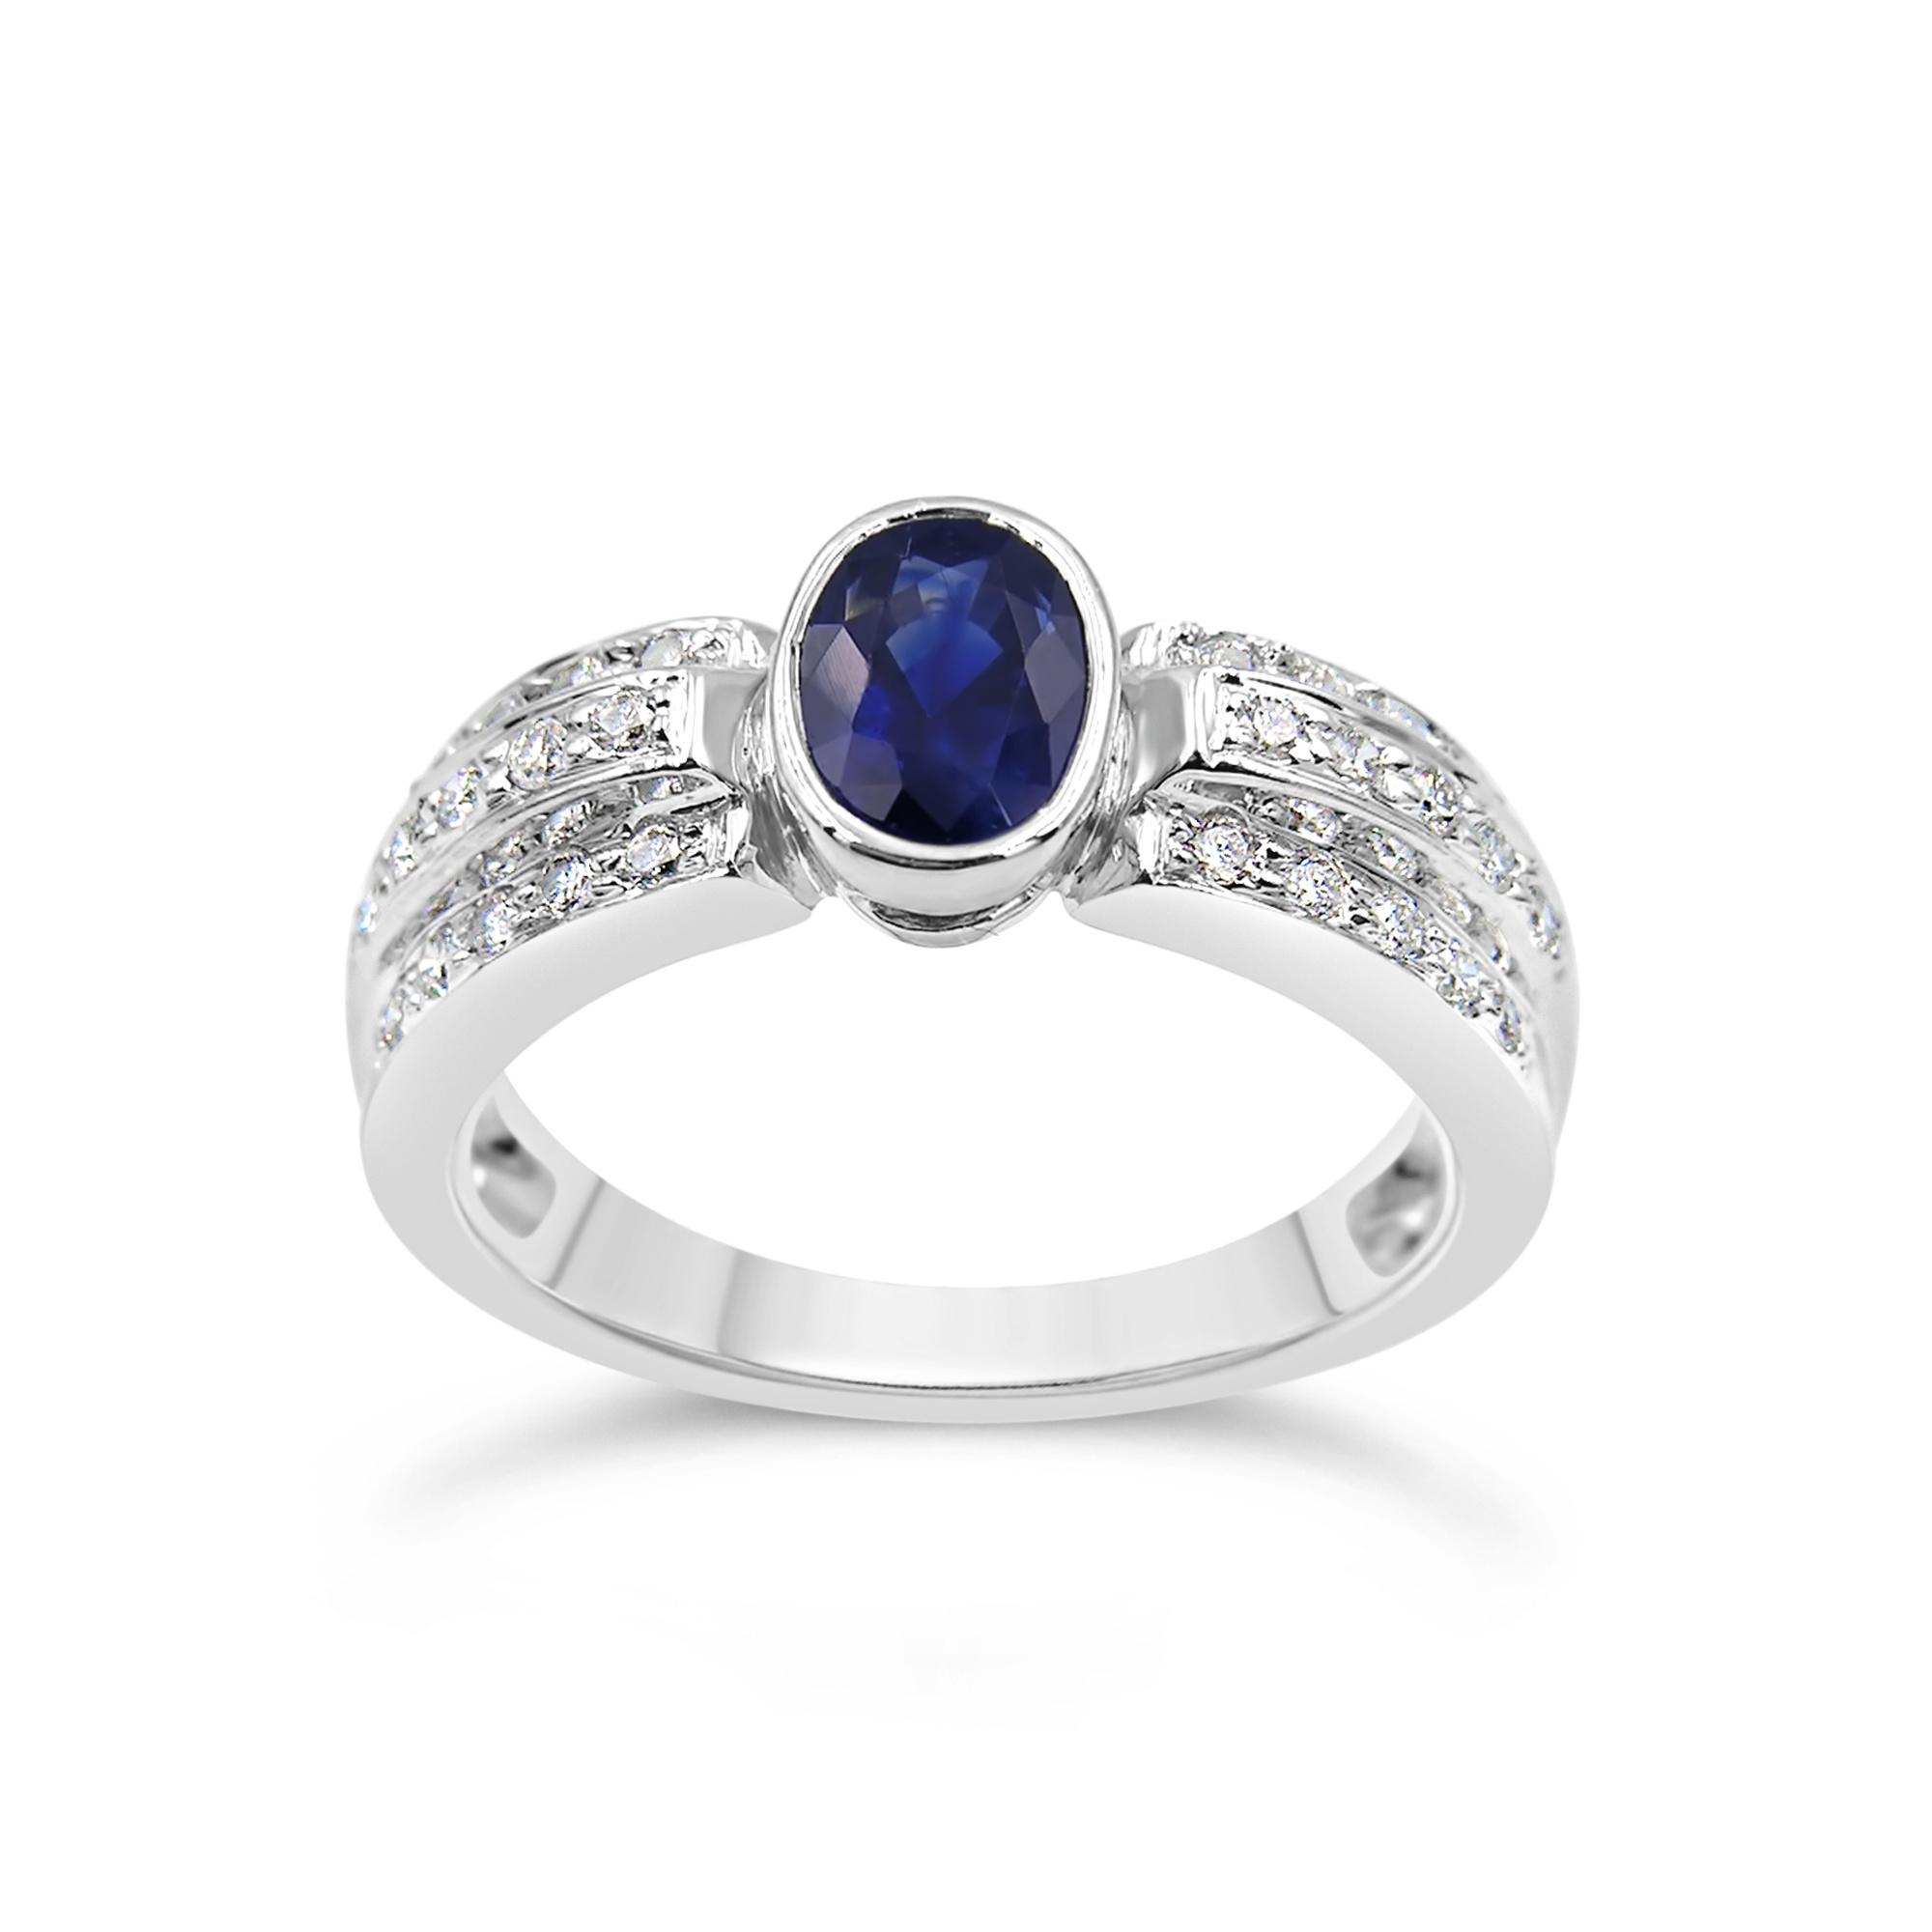 18 karat white gold ring with 0.28 ct diamonds  & 0.75 ct sapphire